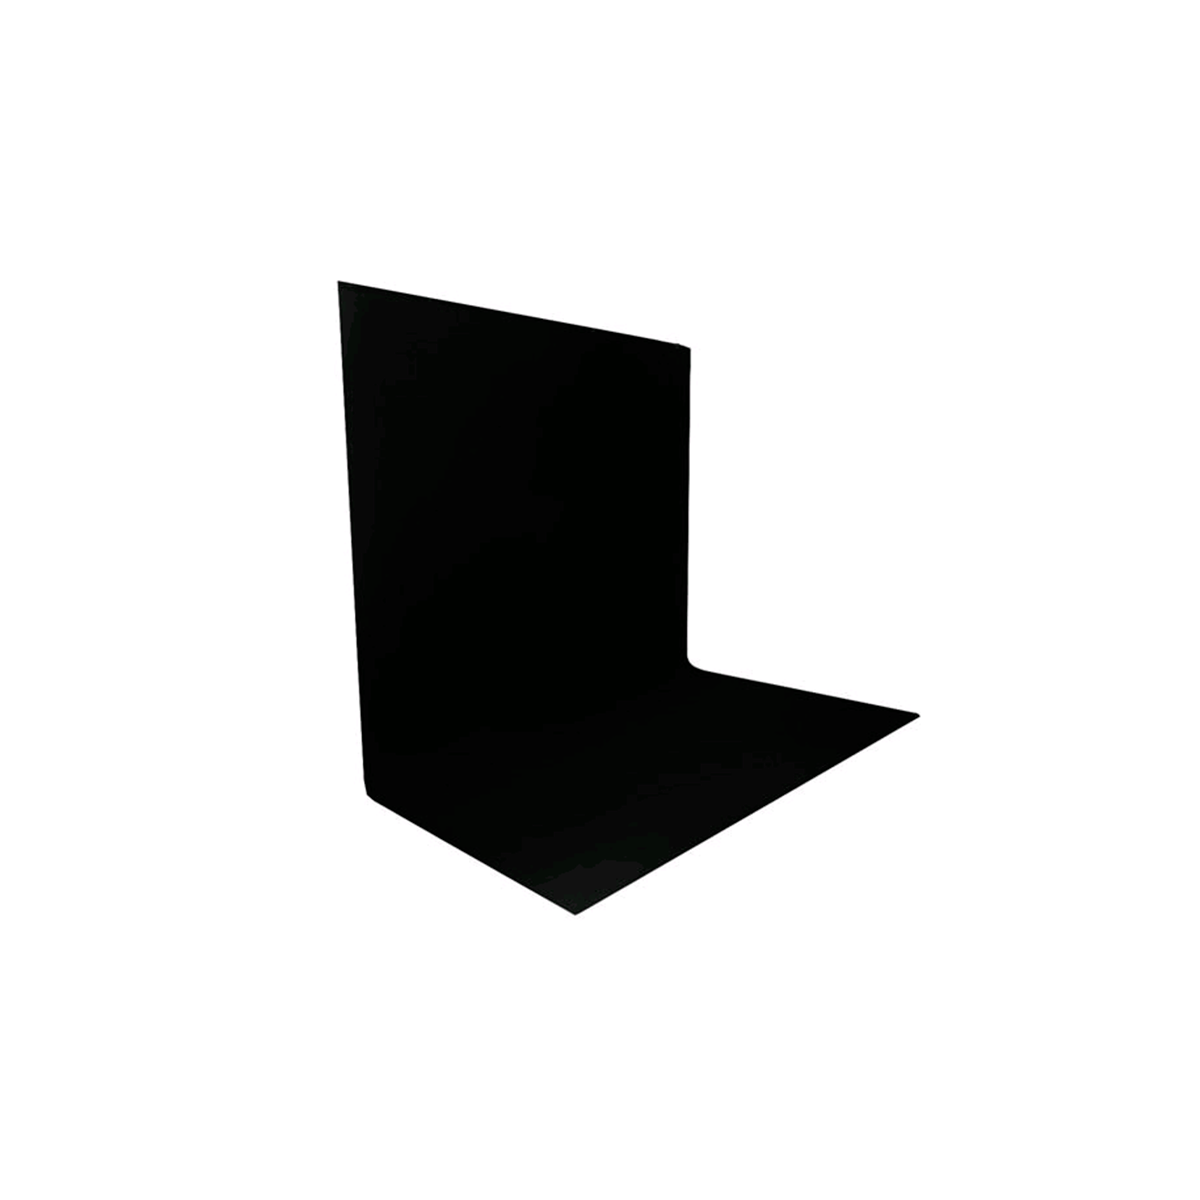 Tecido para Fundo Infinito 3m x 4m Equifoto - Preto  - Fotolux